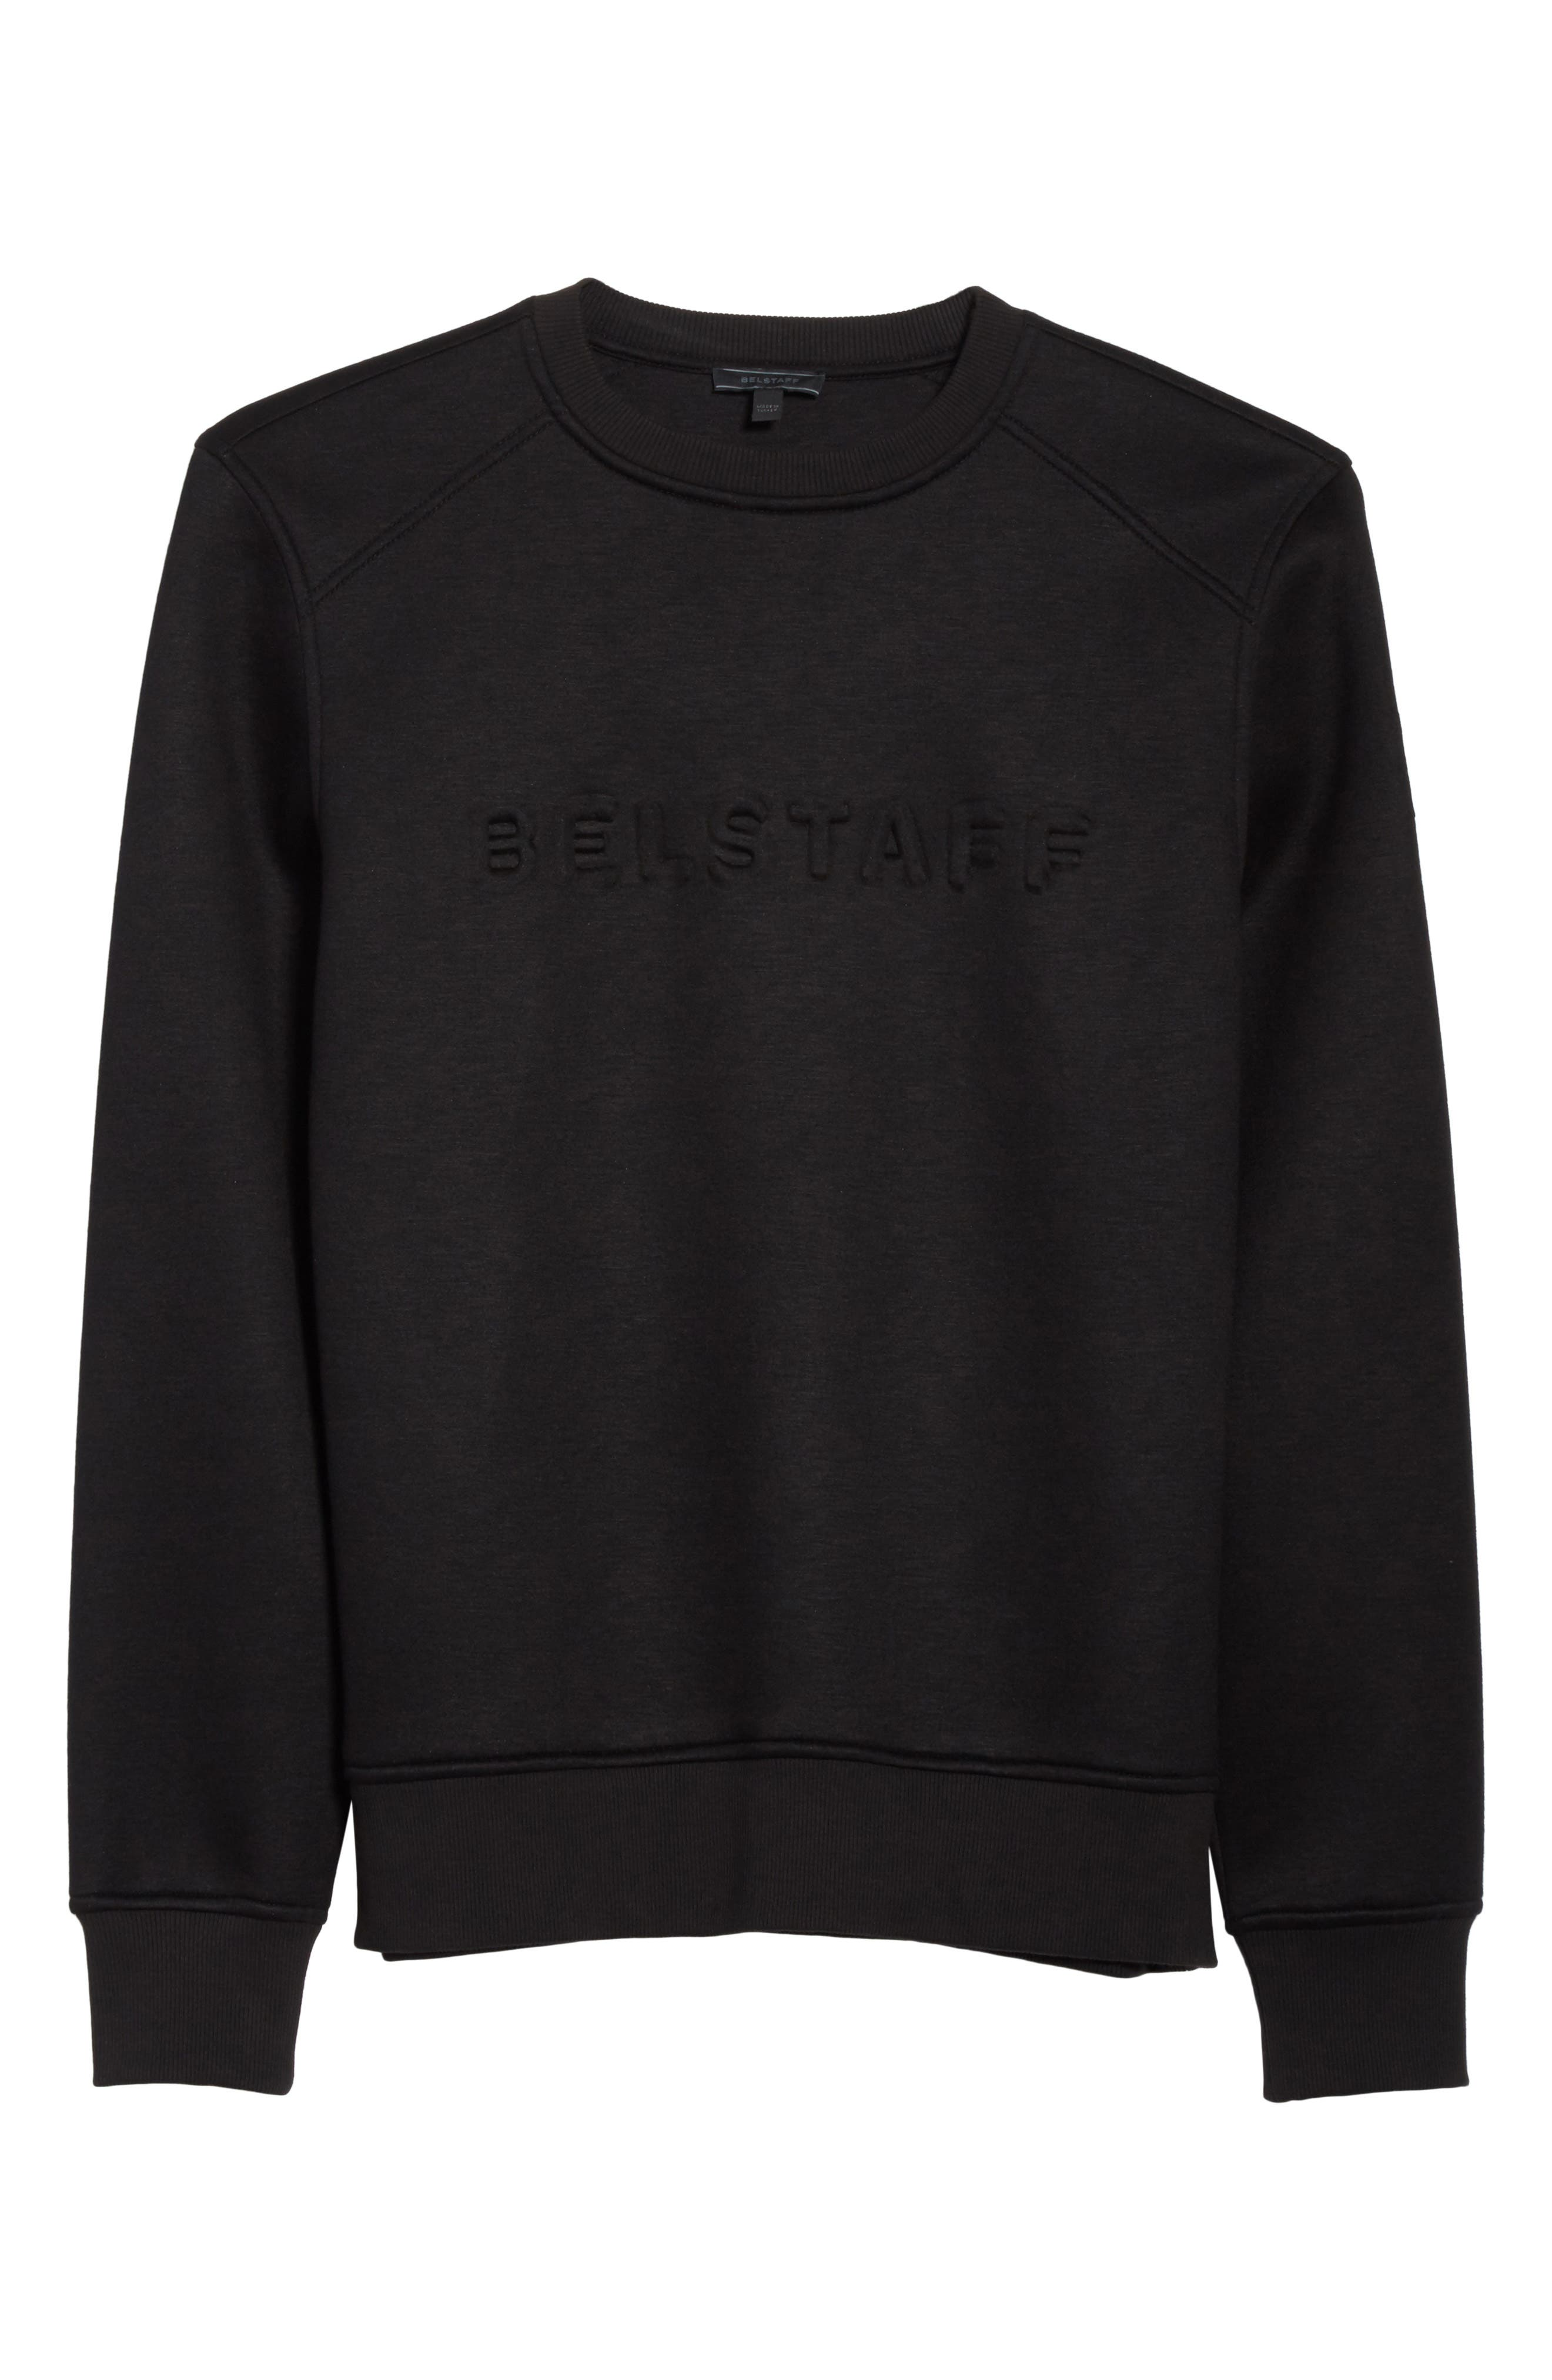 Belsford Crewneck Sweatshirt,                             Alternate thumbnail 6, color,                             001